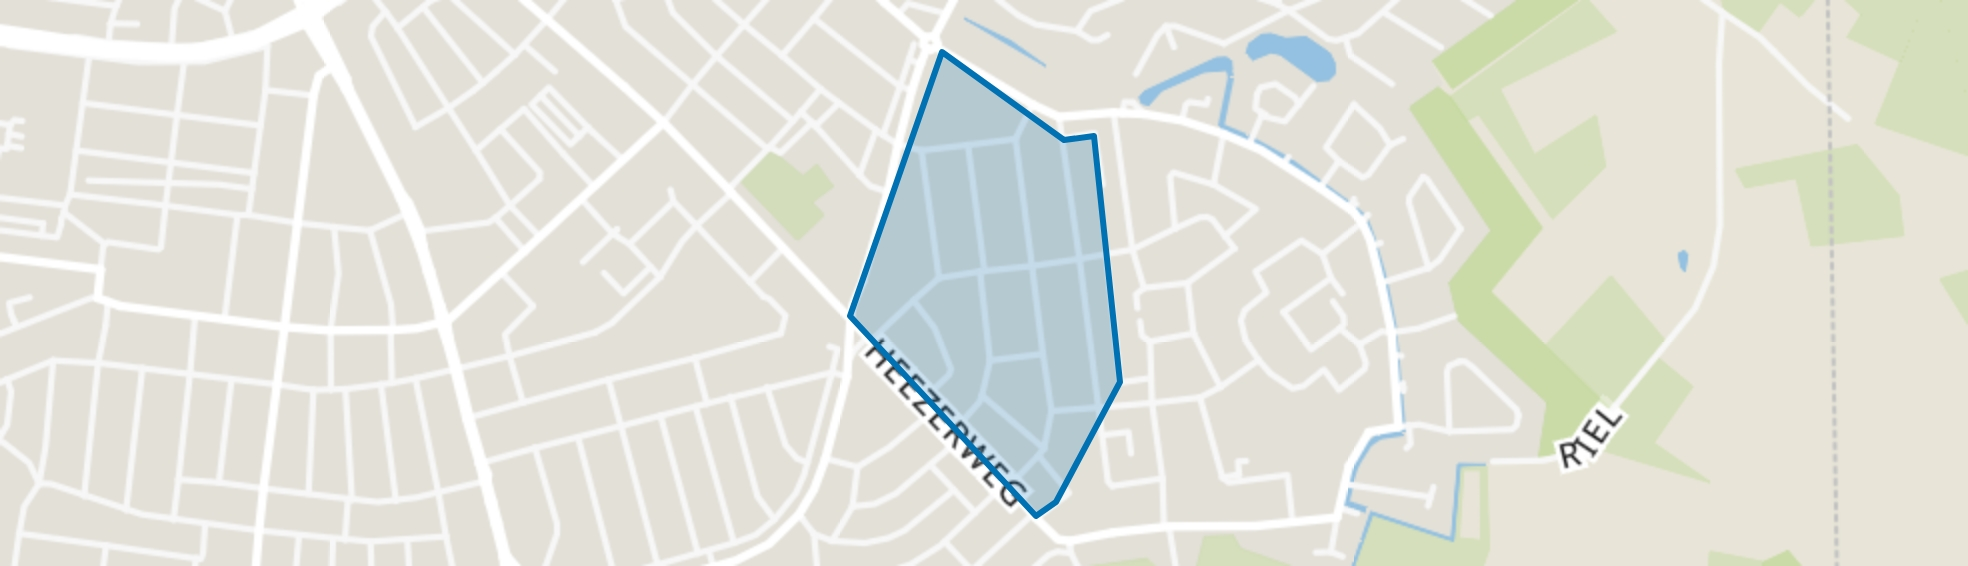 Tivoli, Eindhoven map